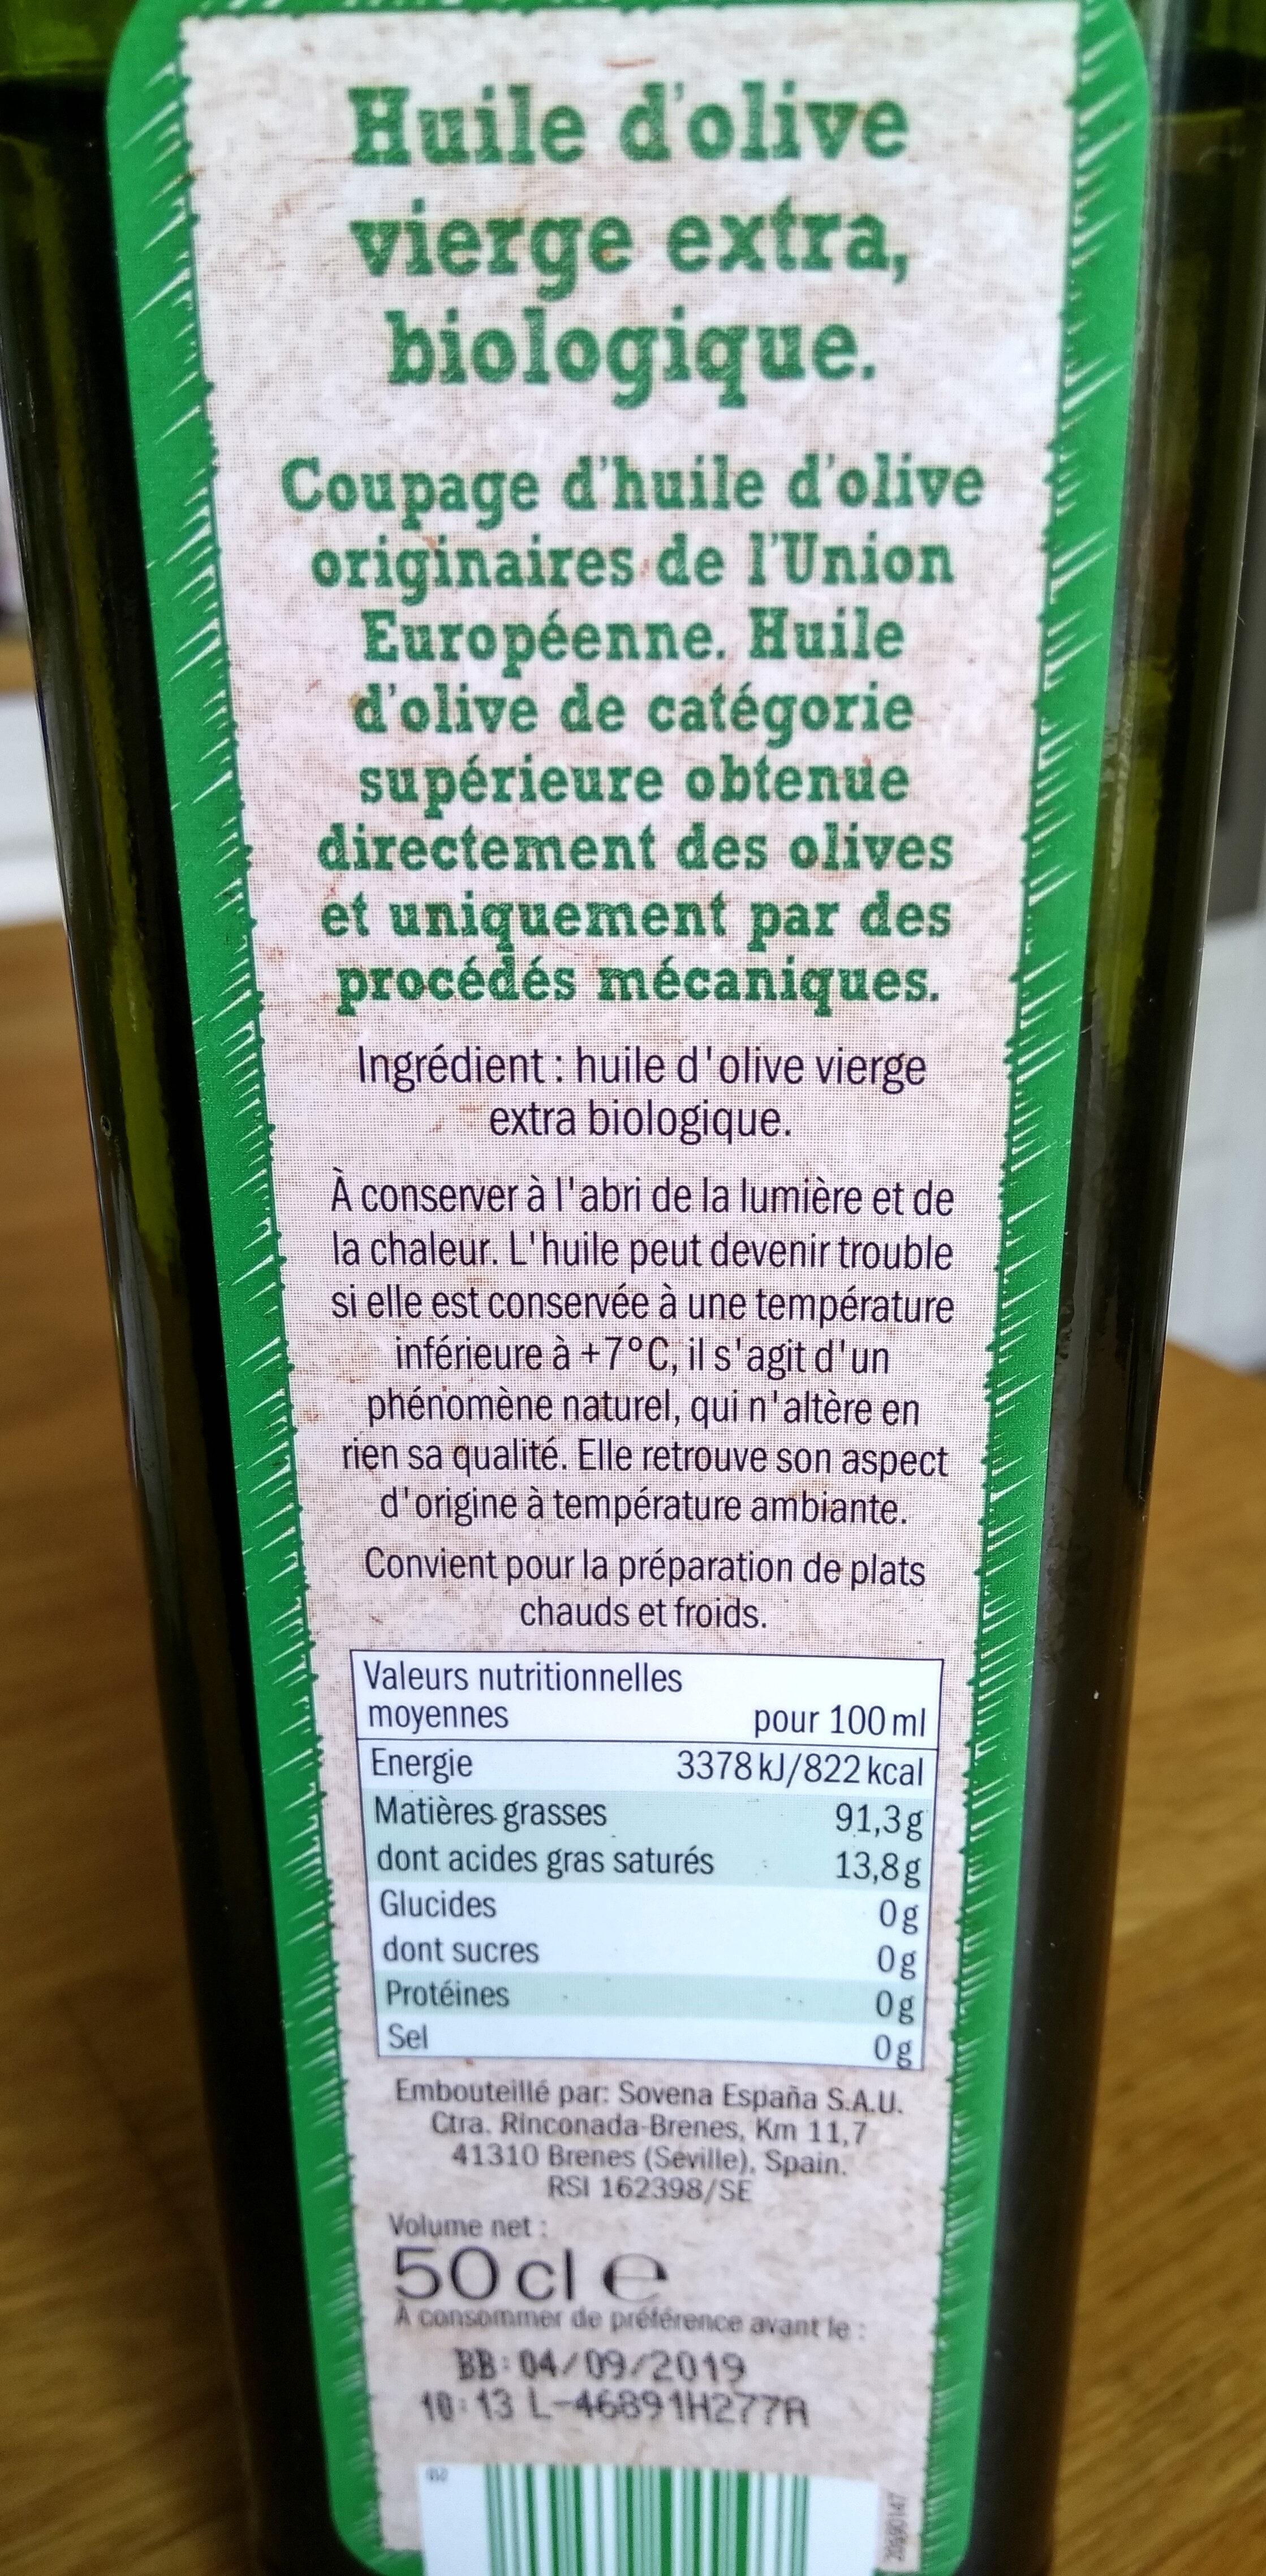 Bio Huile d'olive vierge extra - Ingredients